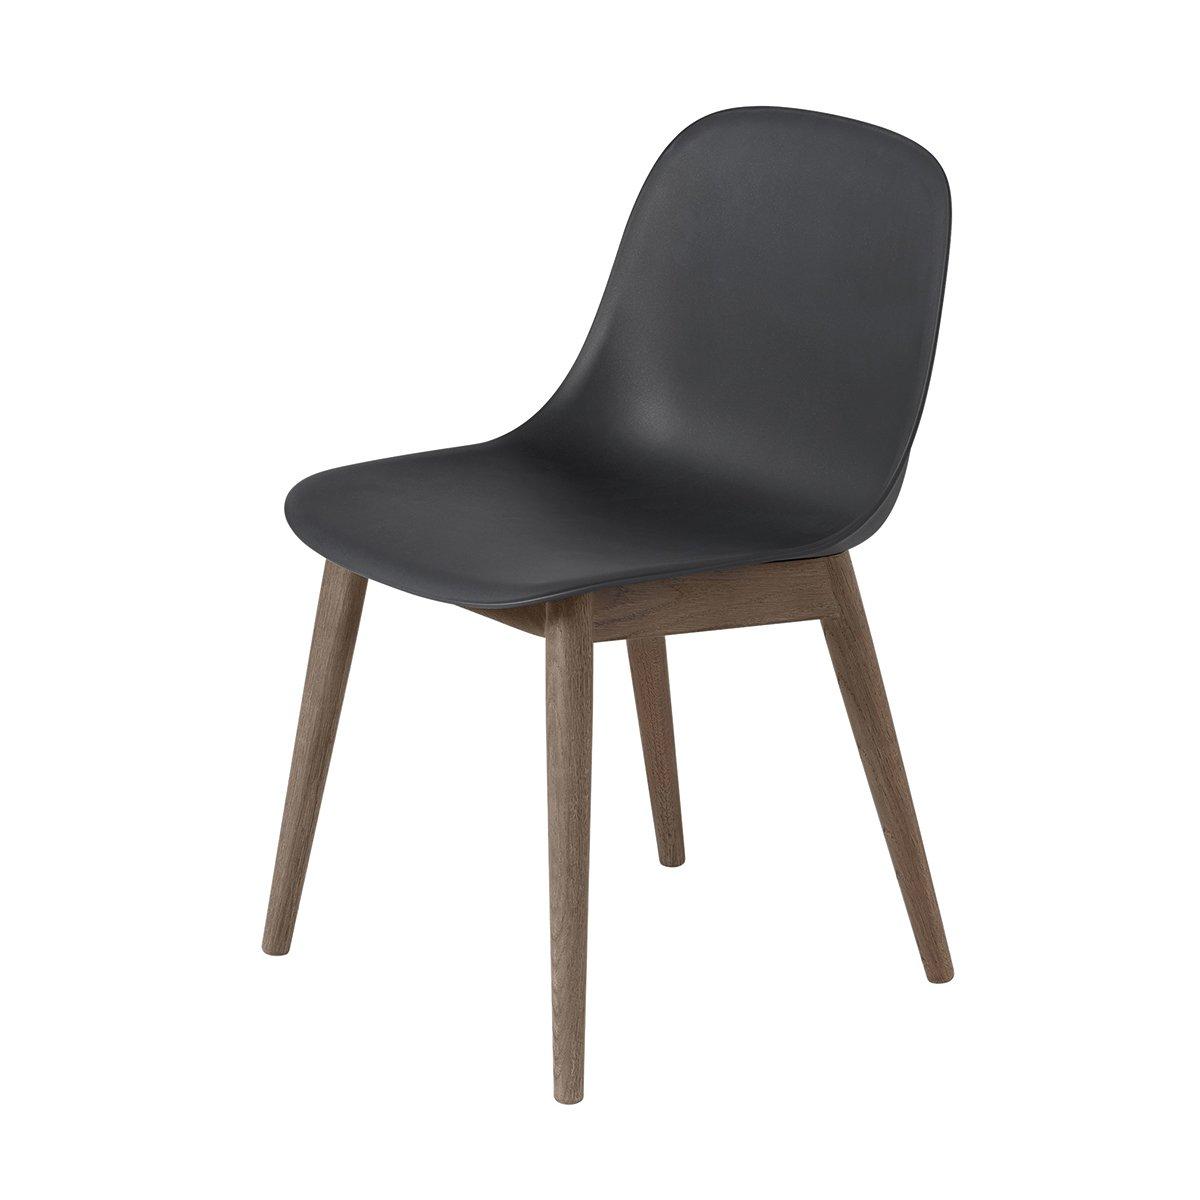 Muuto Fiber Side Chair Stoel, houten poten - Donkerbruin/Zwart